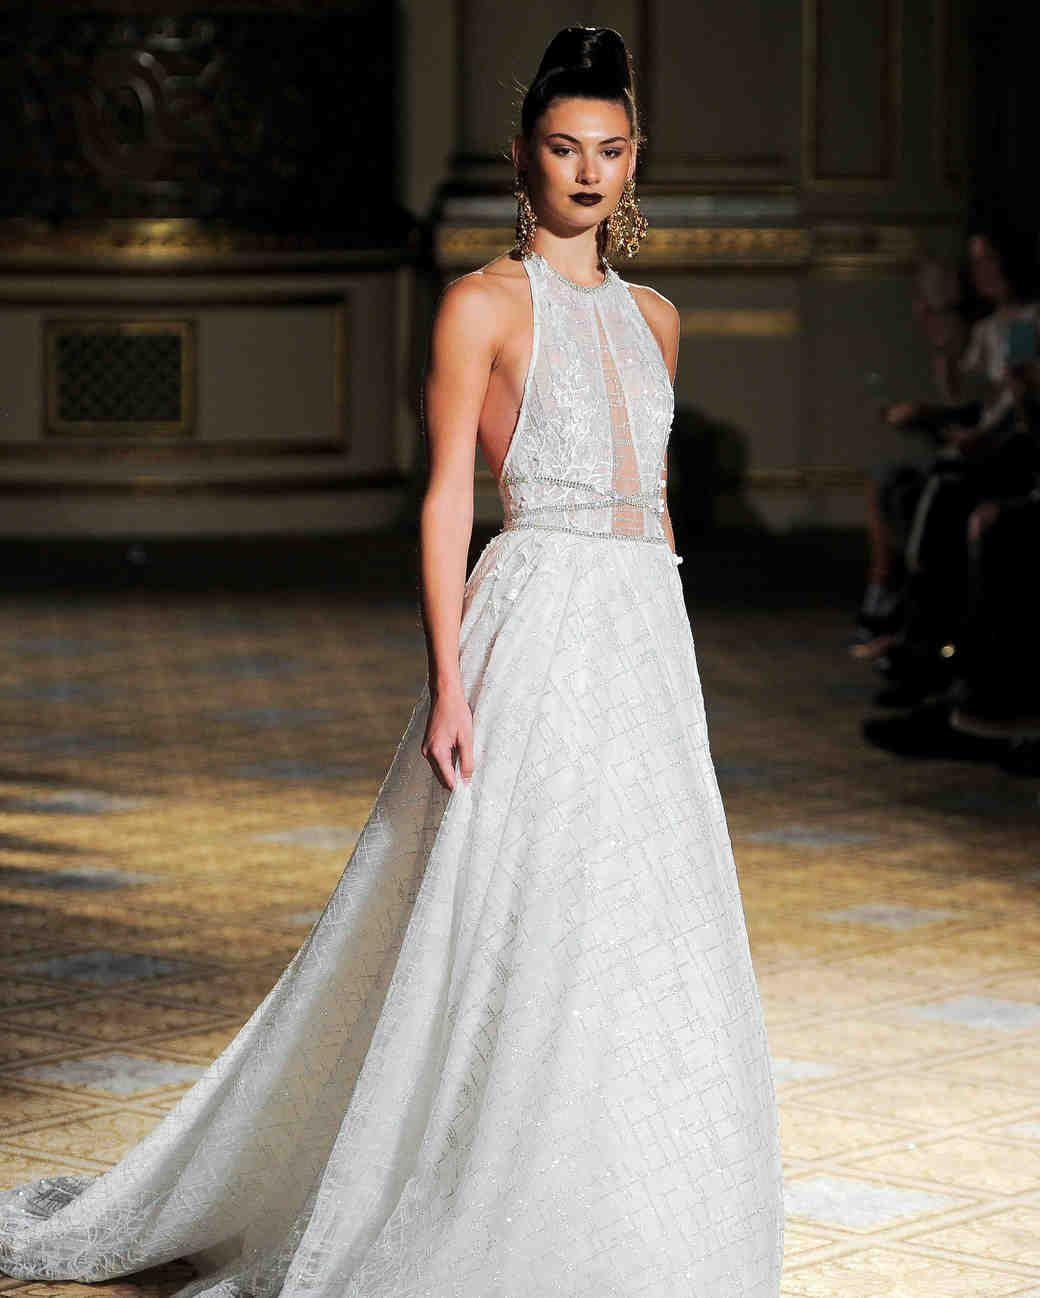 Halter wedding dresses 2018 pictures